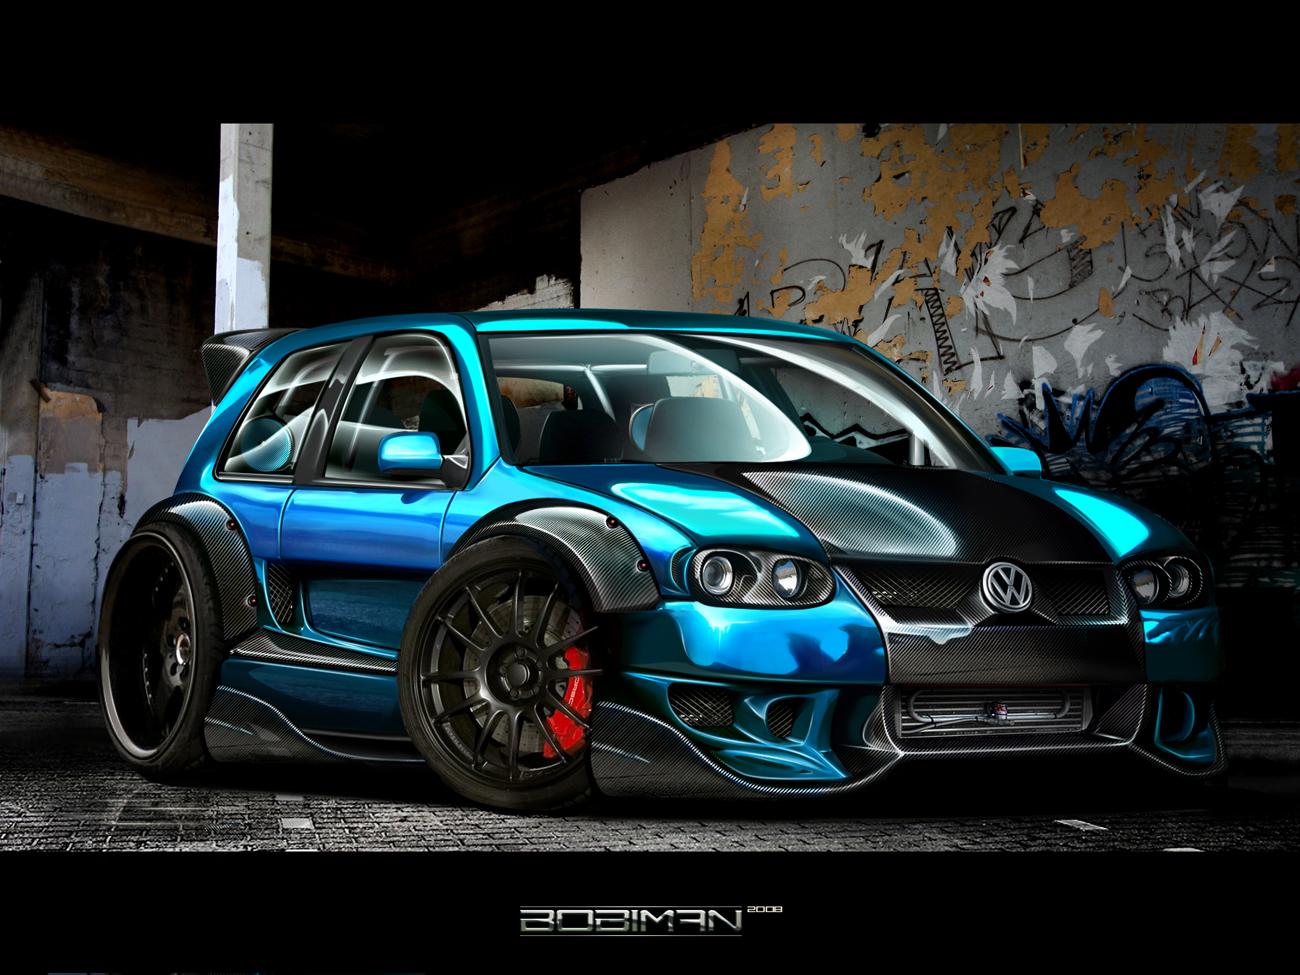 Sports Car Cool Car Wallpapers 1300x975